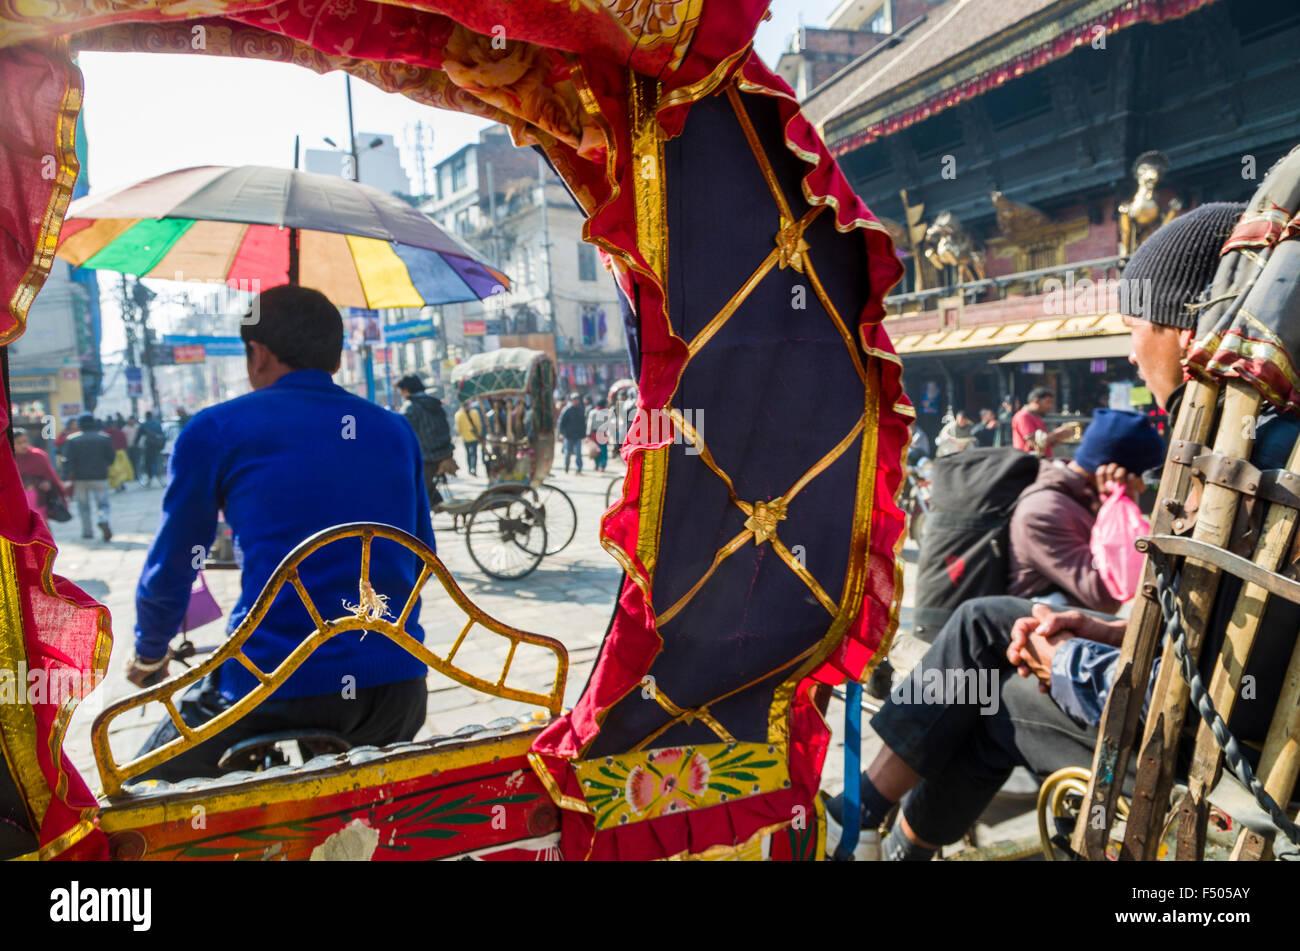 Rikshaw drivers waiting for customers Stock Photo